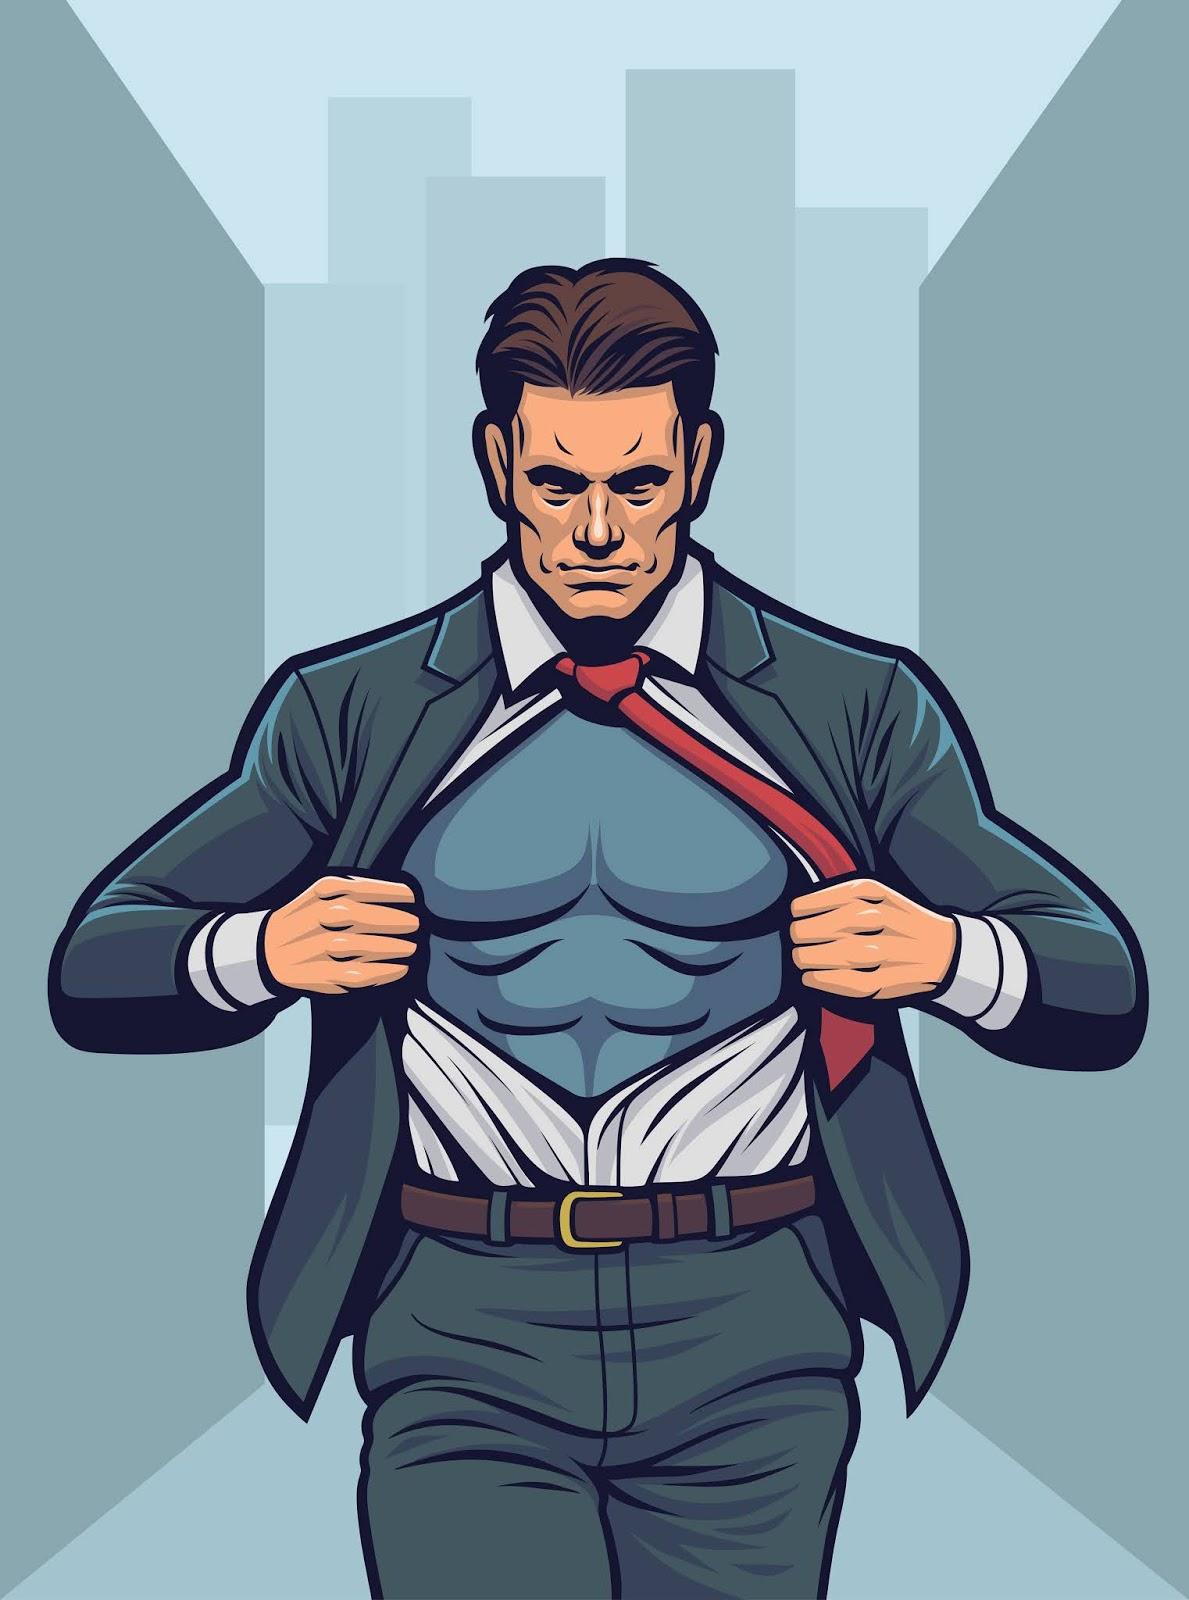 Superhero Tearing Shirt Free Download Vector CDR, AI, EPS and PNG Formats